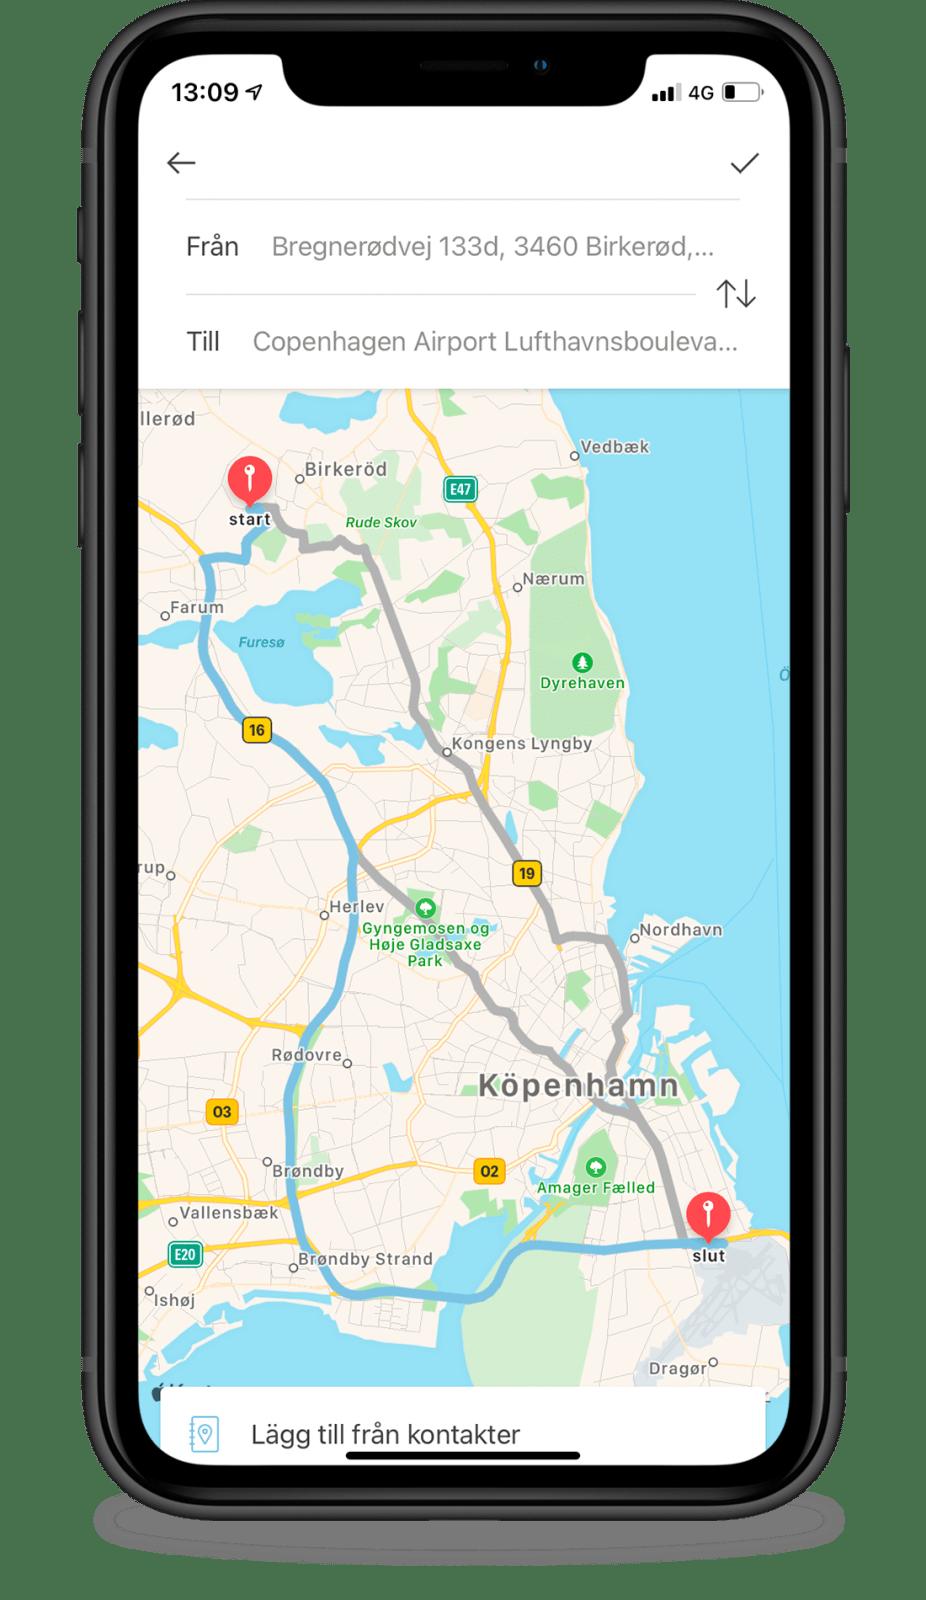 Ange körning manuellt via Google Maps i Acubiz.